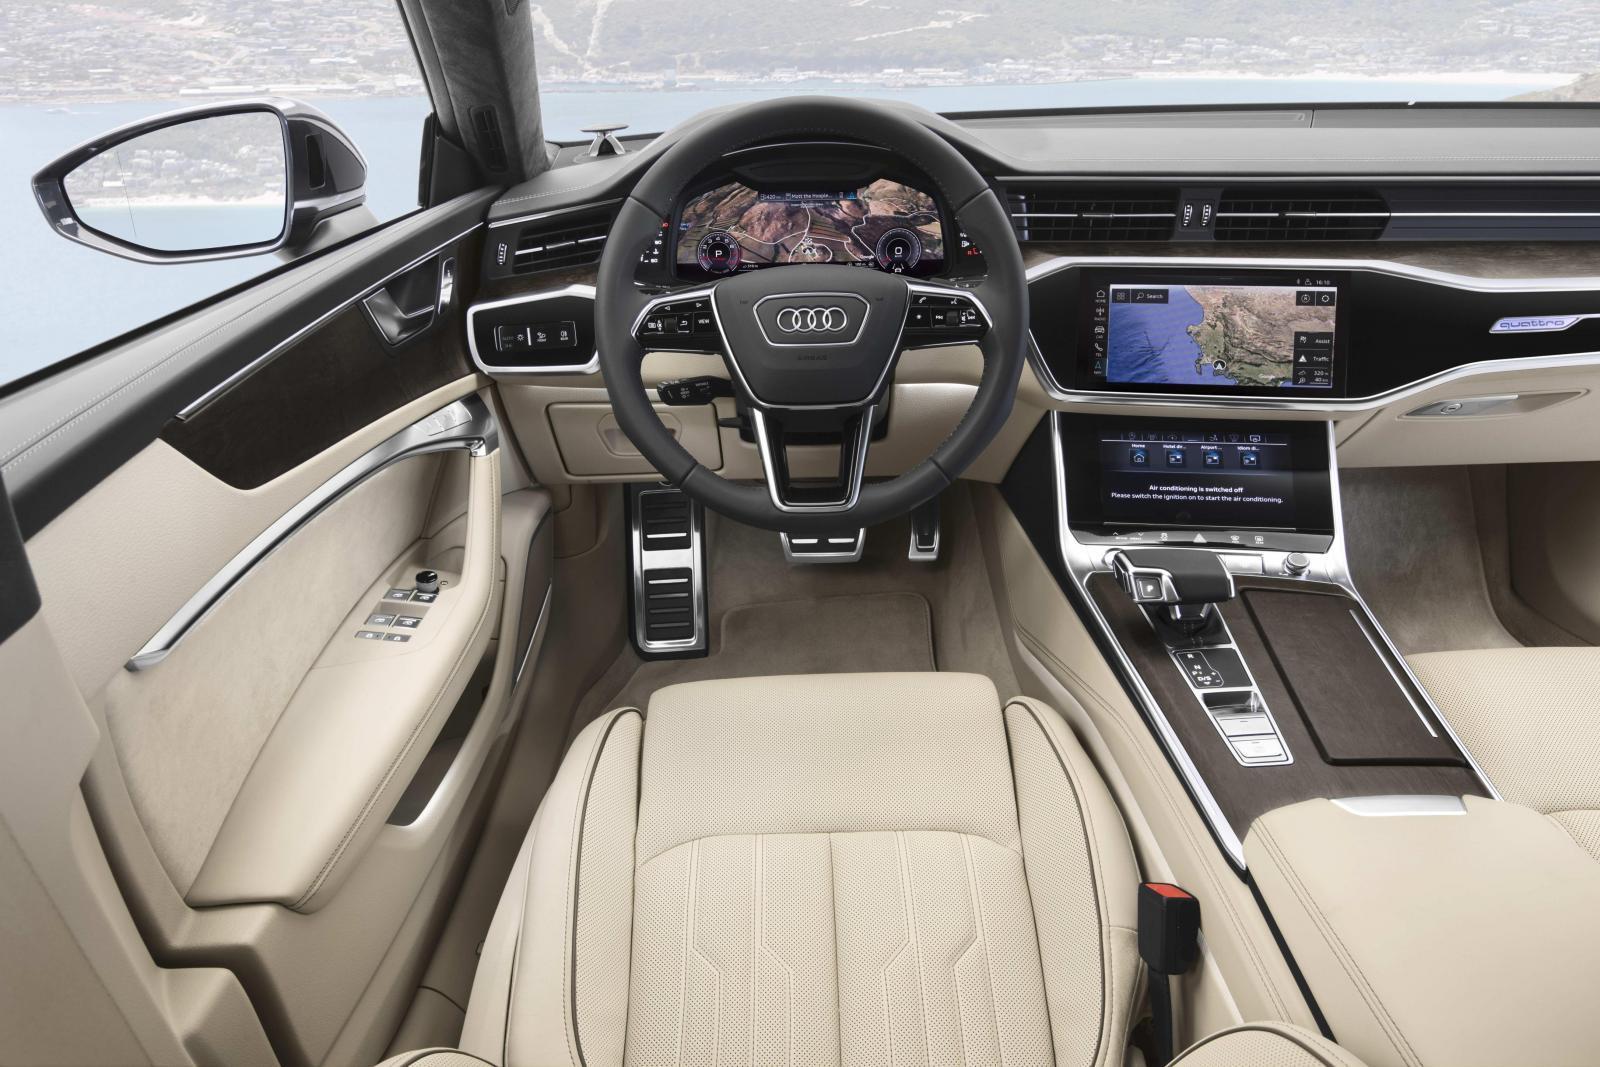 1517526_Audi_A7_Kapstadt_2018_triton_interieur-1003.jpg